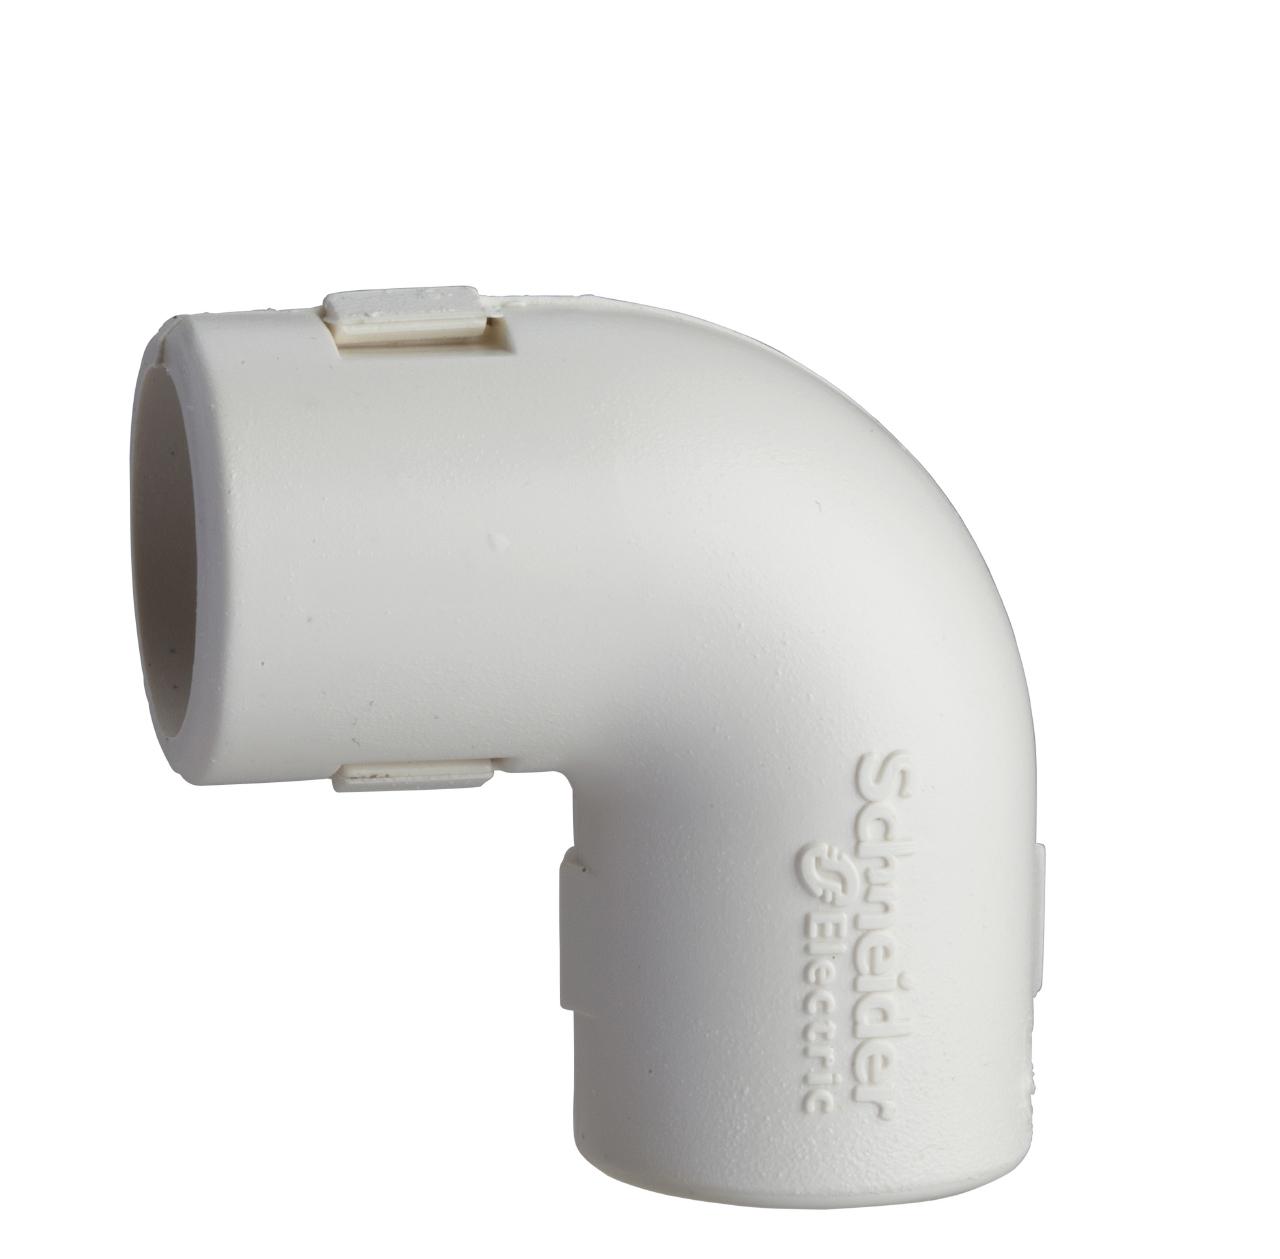 coude querre pour tube irl 3321 diam tre 20 mm blanc. Black Bedroom Furniture Sets. Home Design Ideas